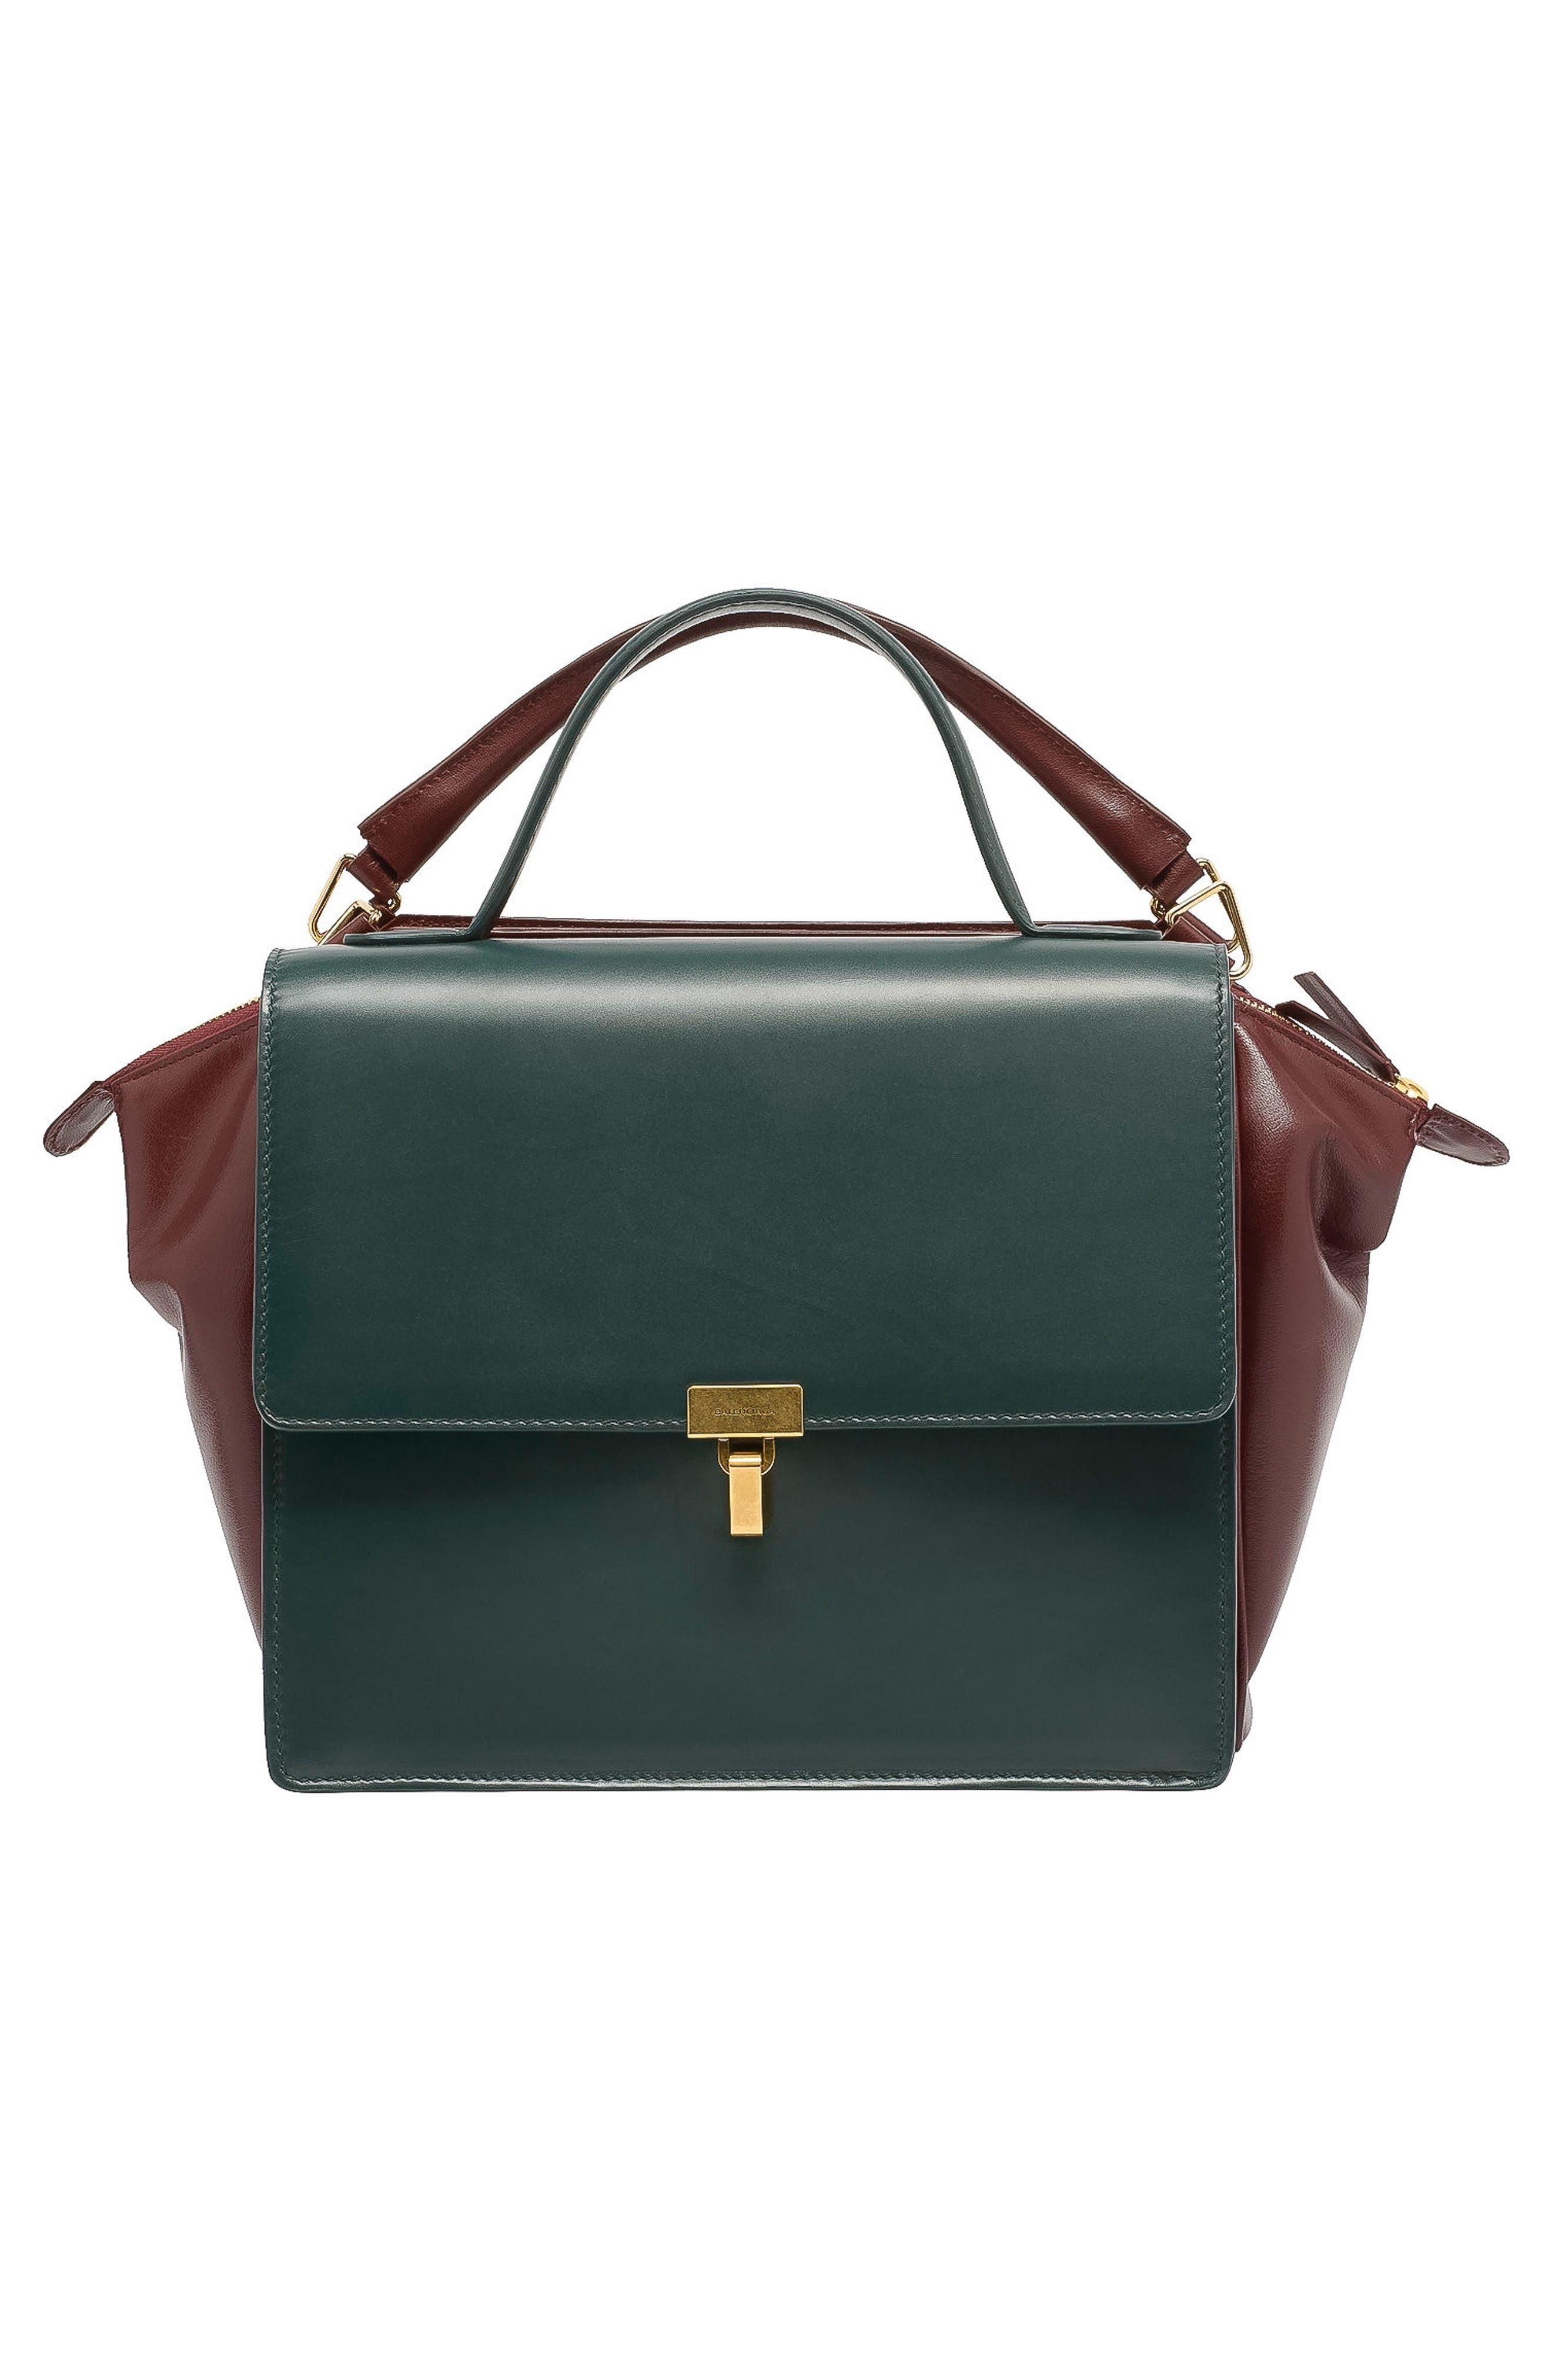 Alternate Image 1 Selected - Balenciaga Collage Double Calfskin Leather Bag